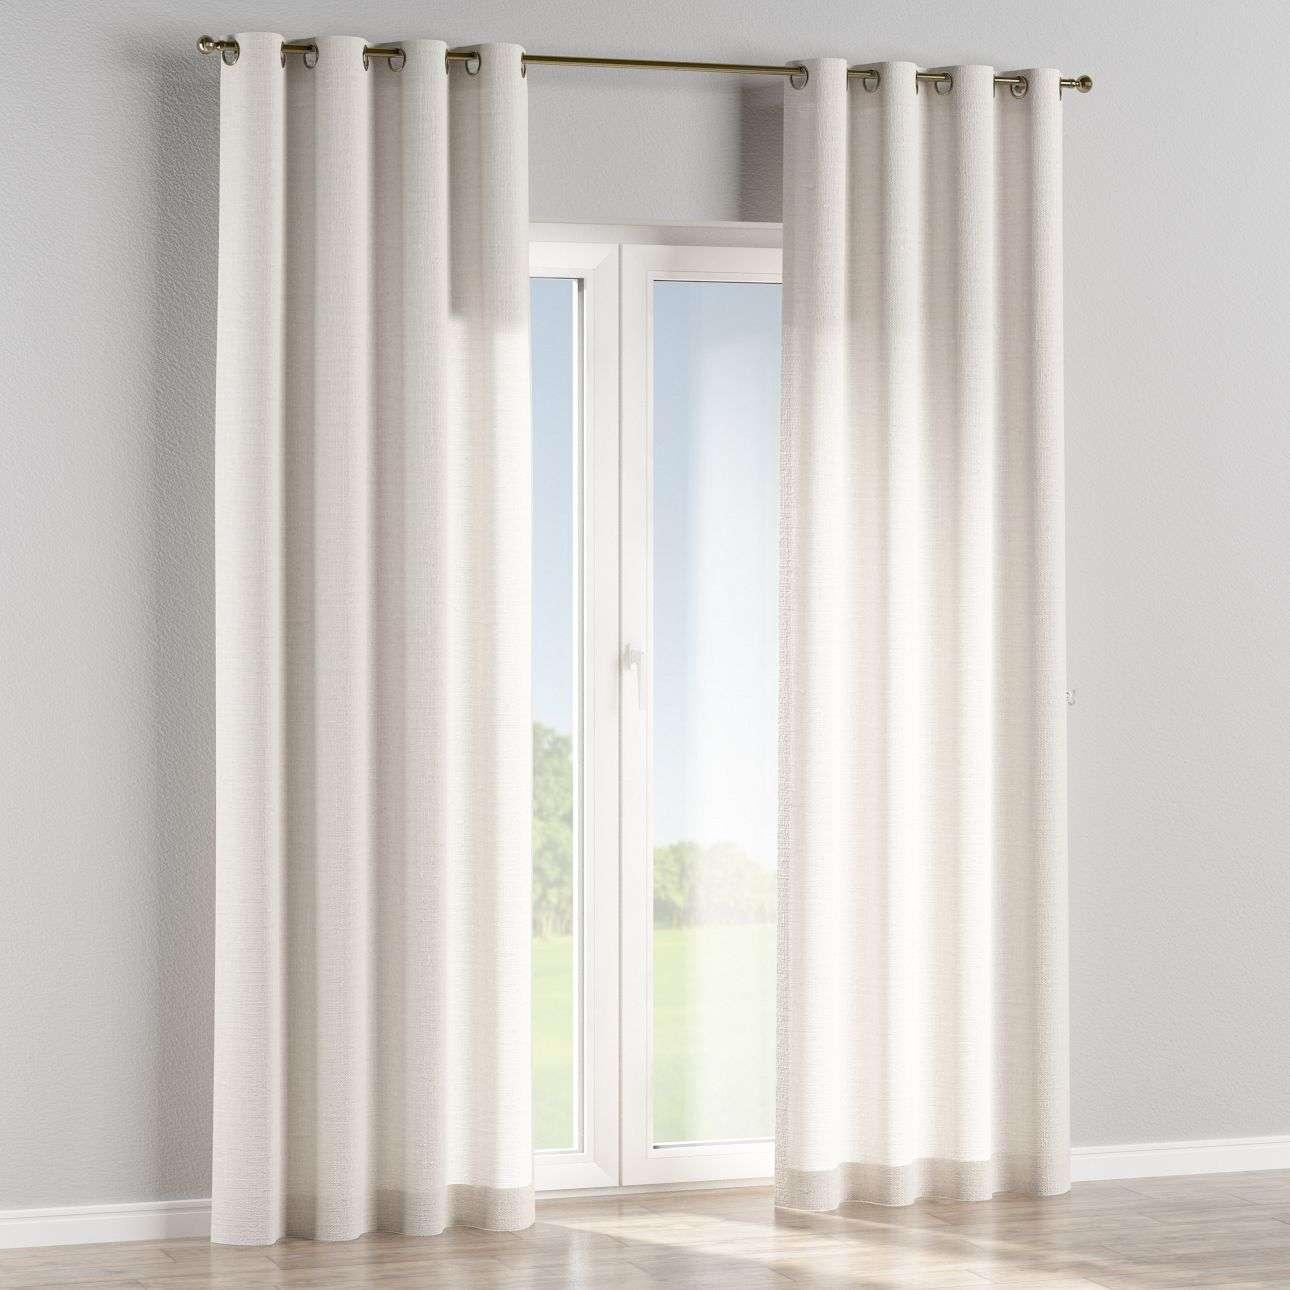 Záves s kolieskami 130 x 260 cm V kolekcii Linen, tkanina: 392-04